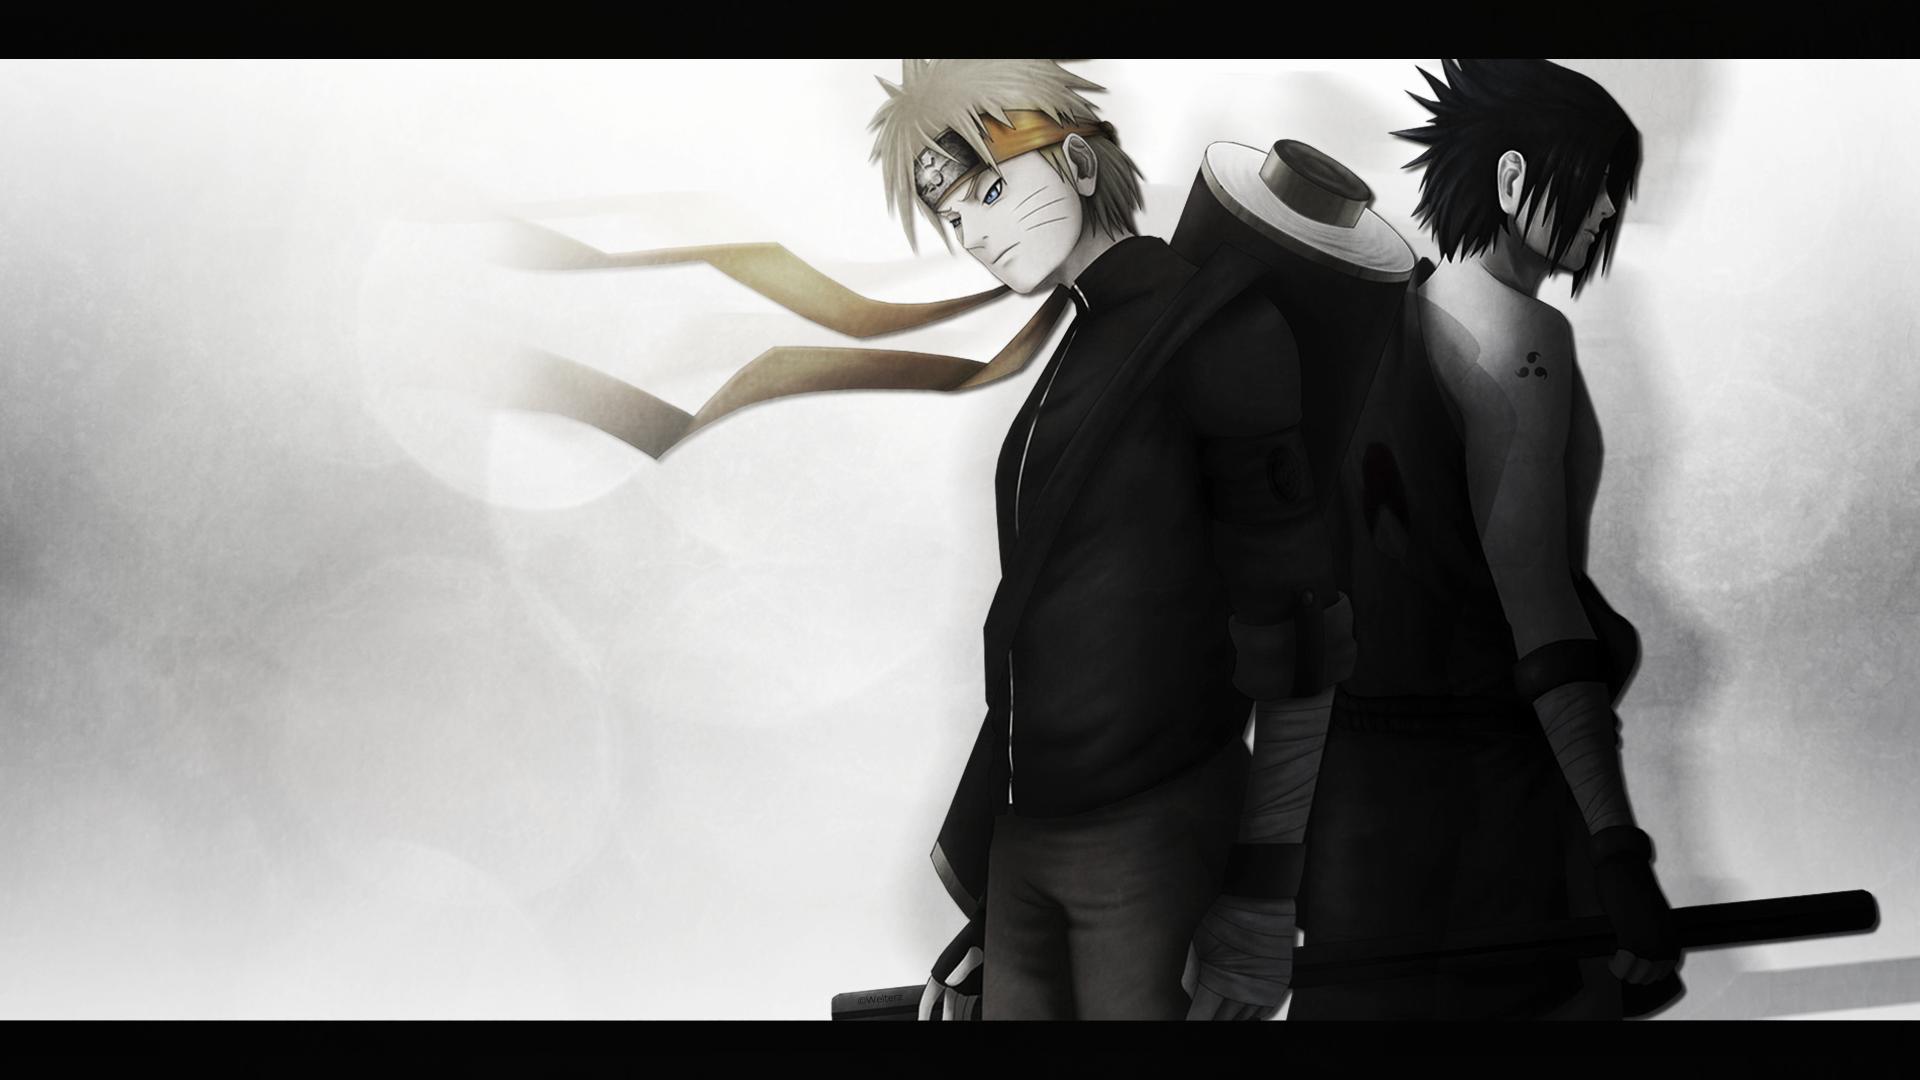 Naruto And Sasuke Power